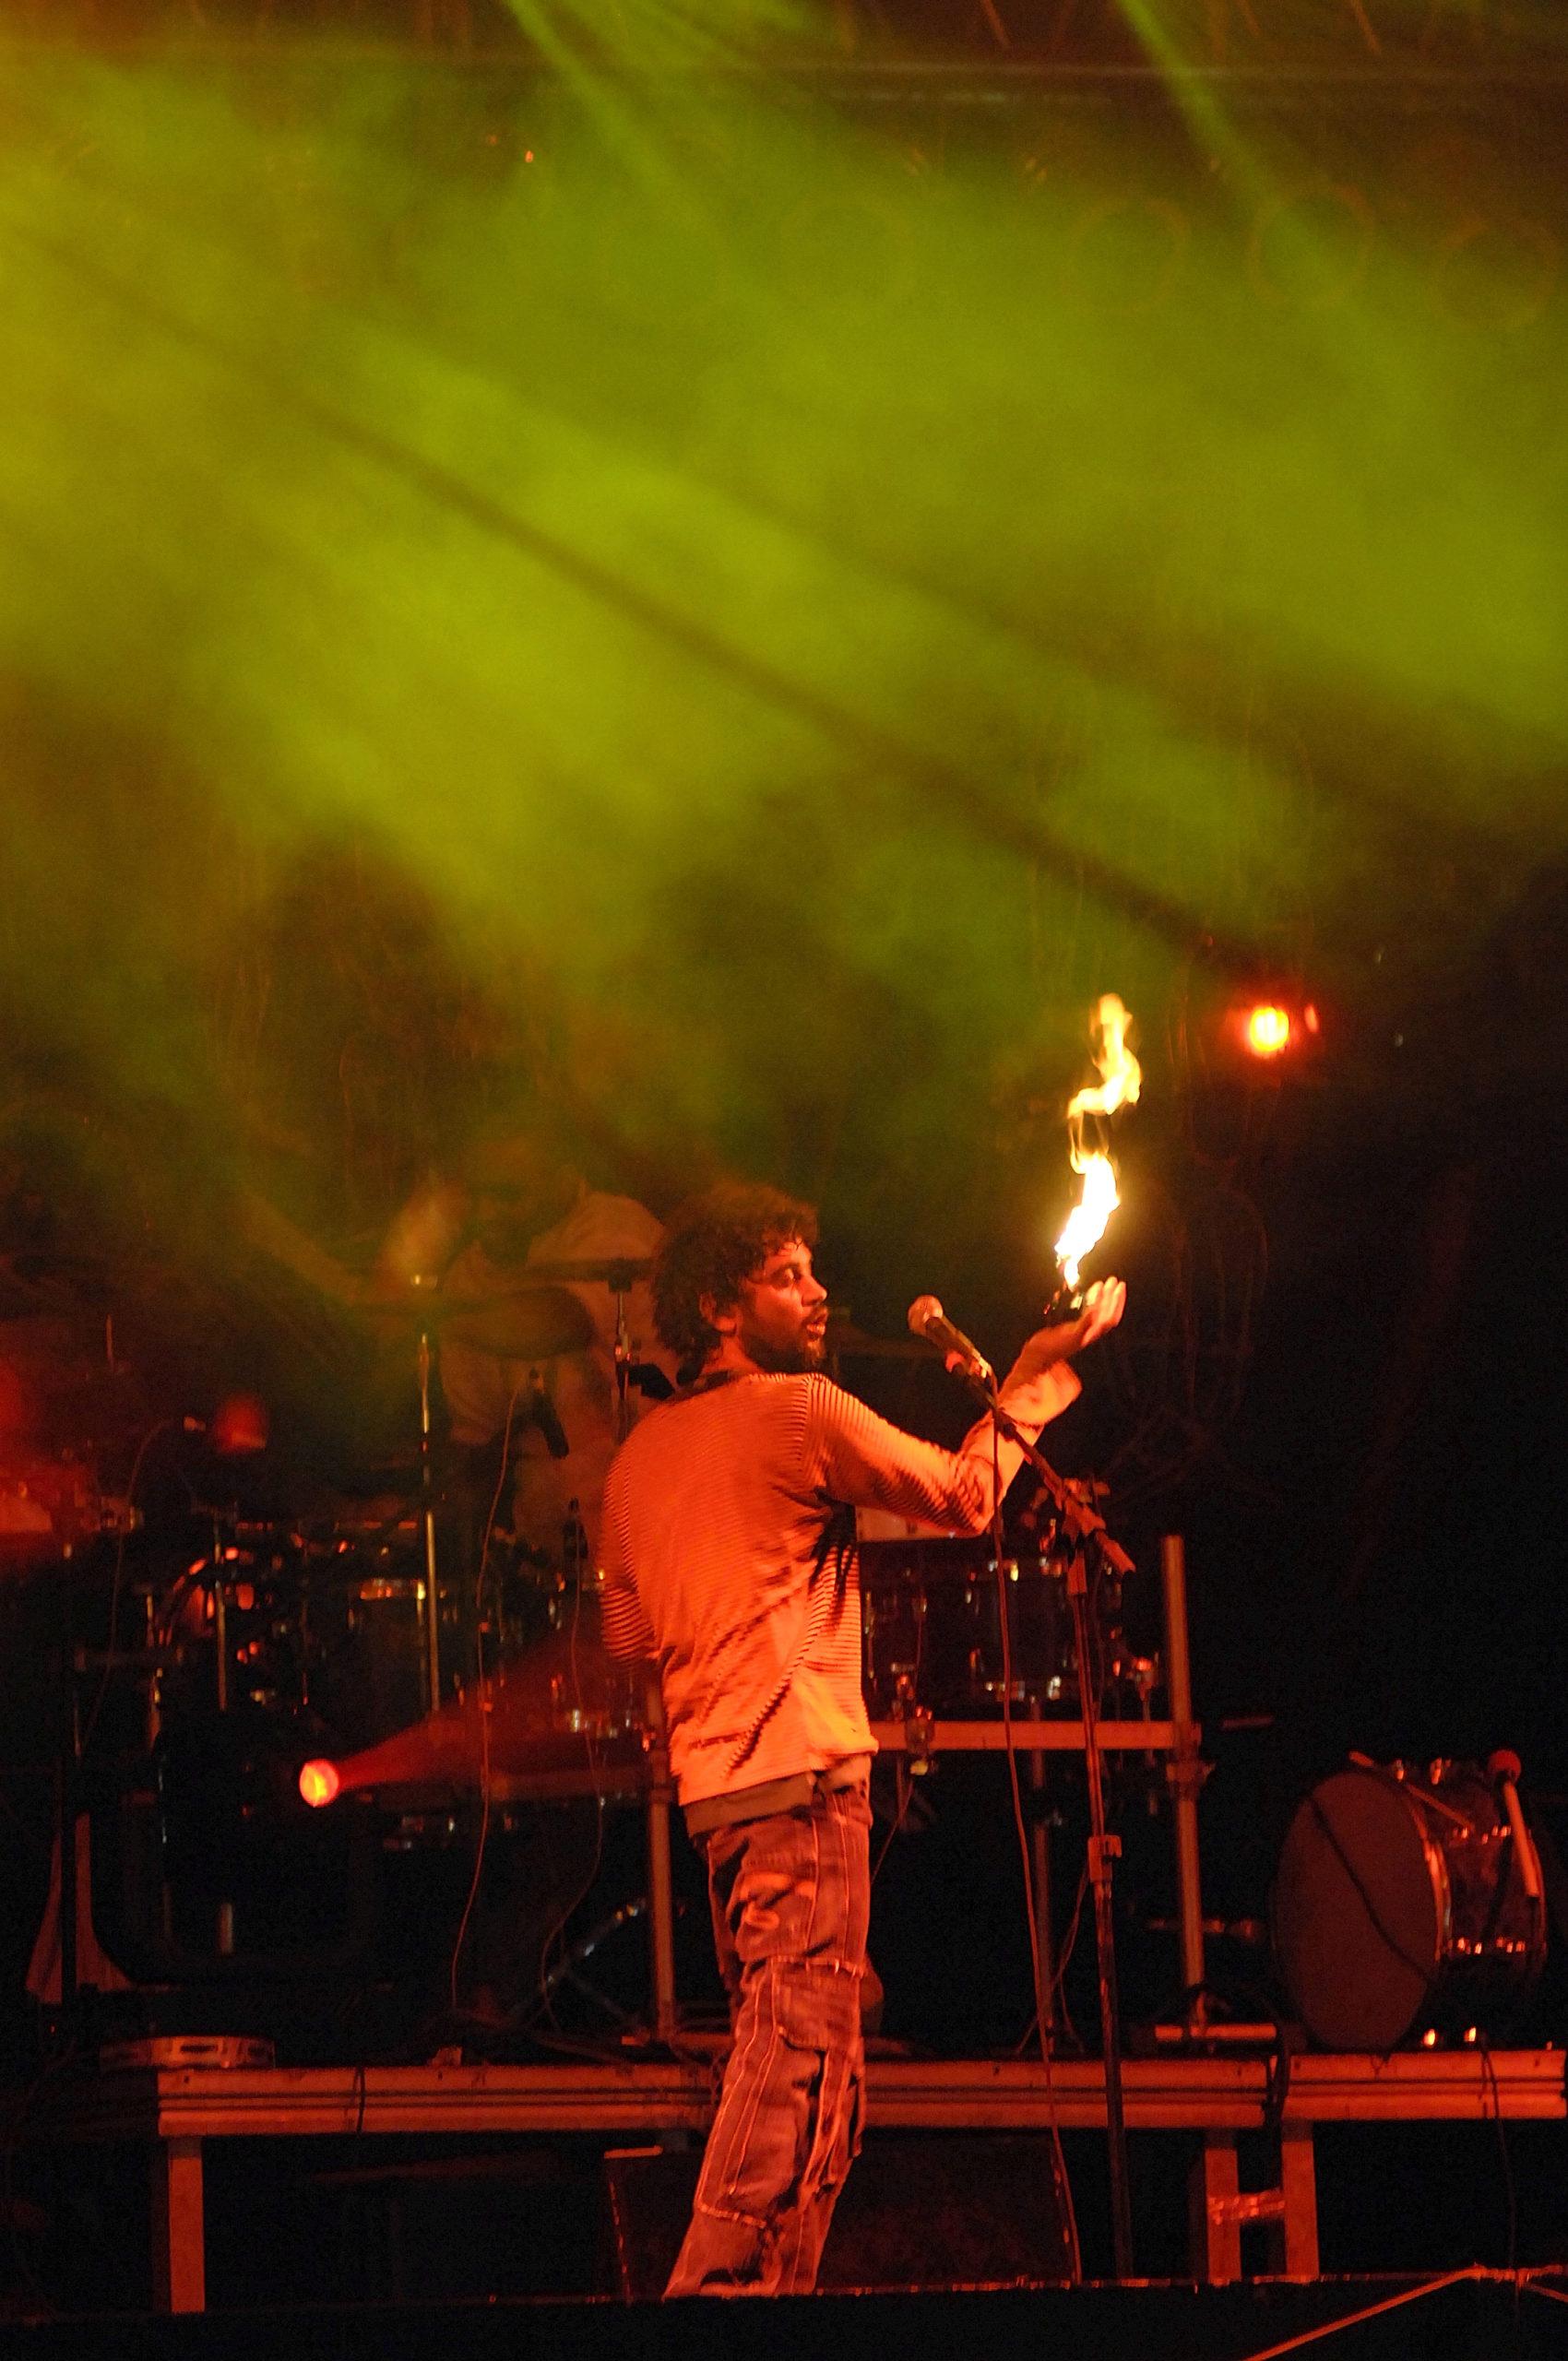 cordel-do-fogo-encantado-foto-jr-panela